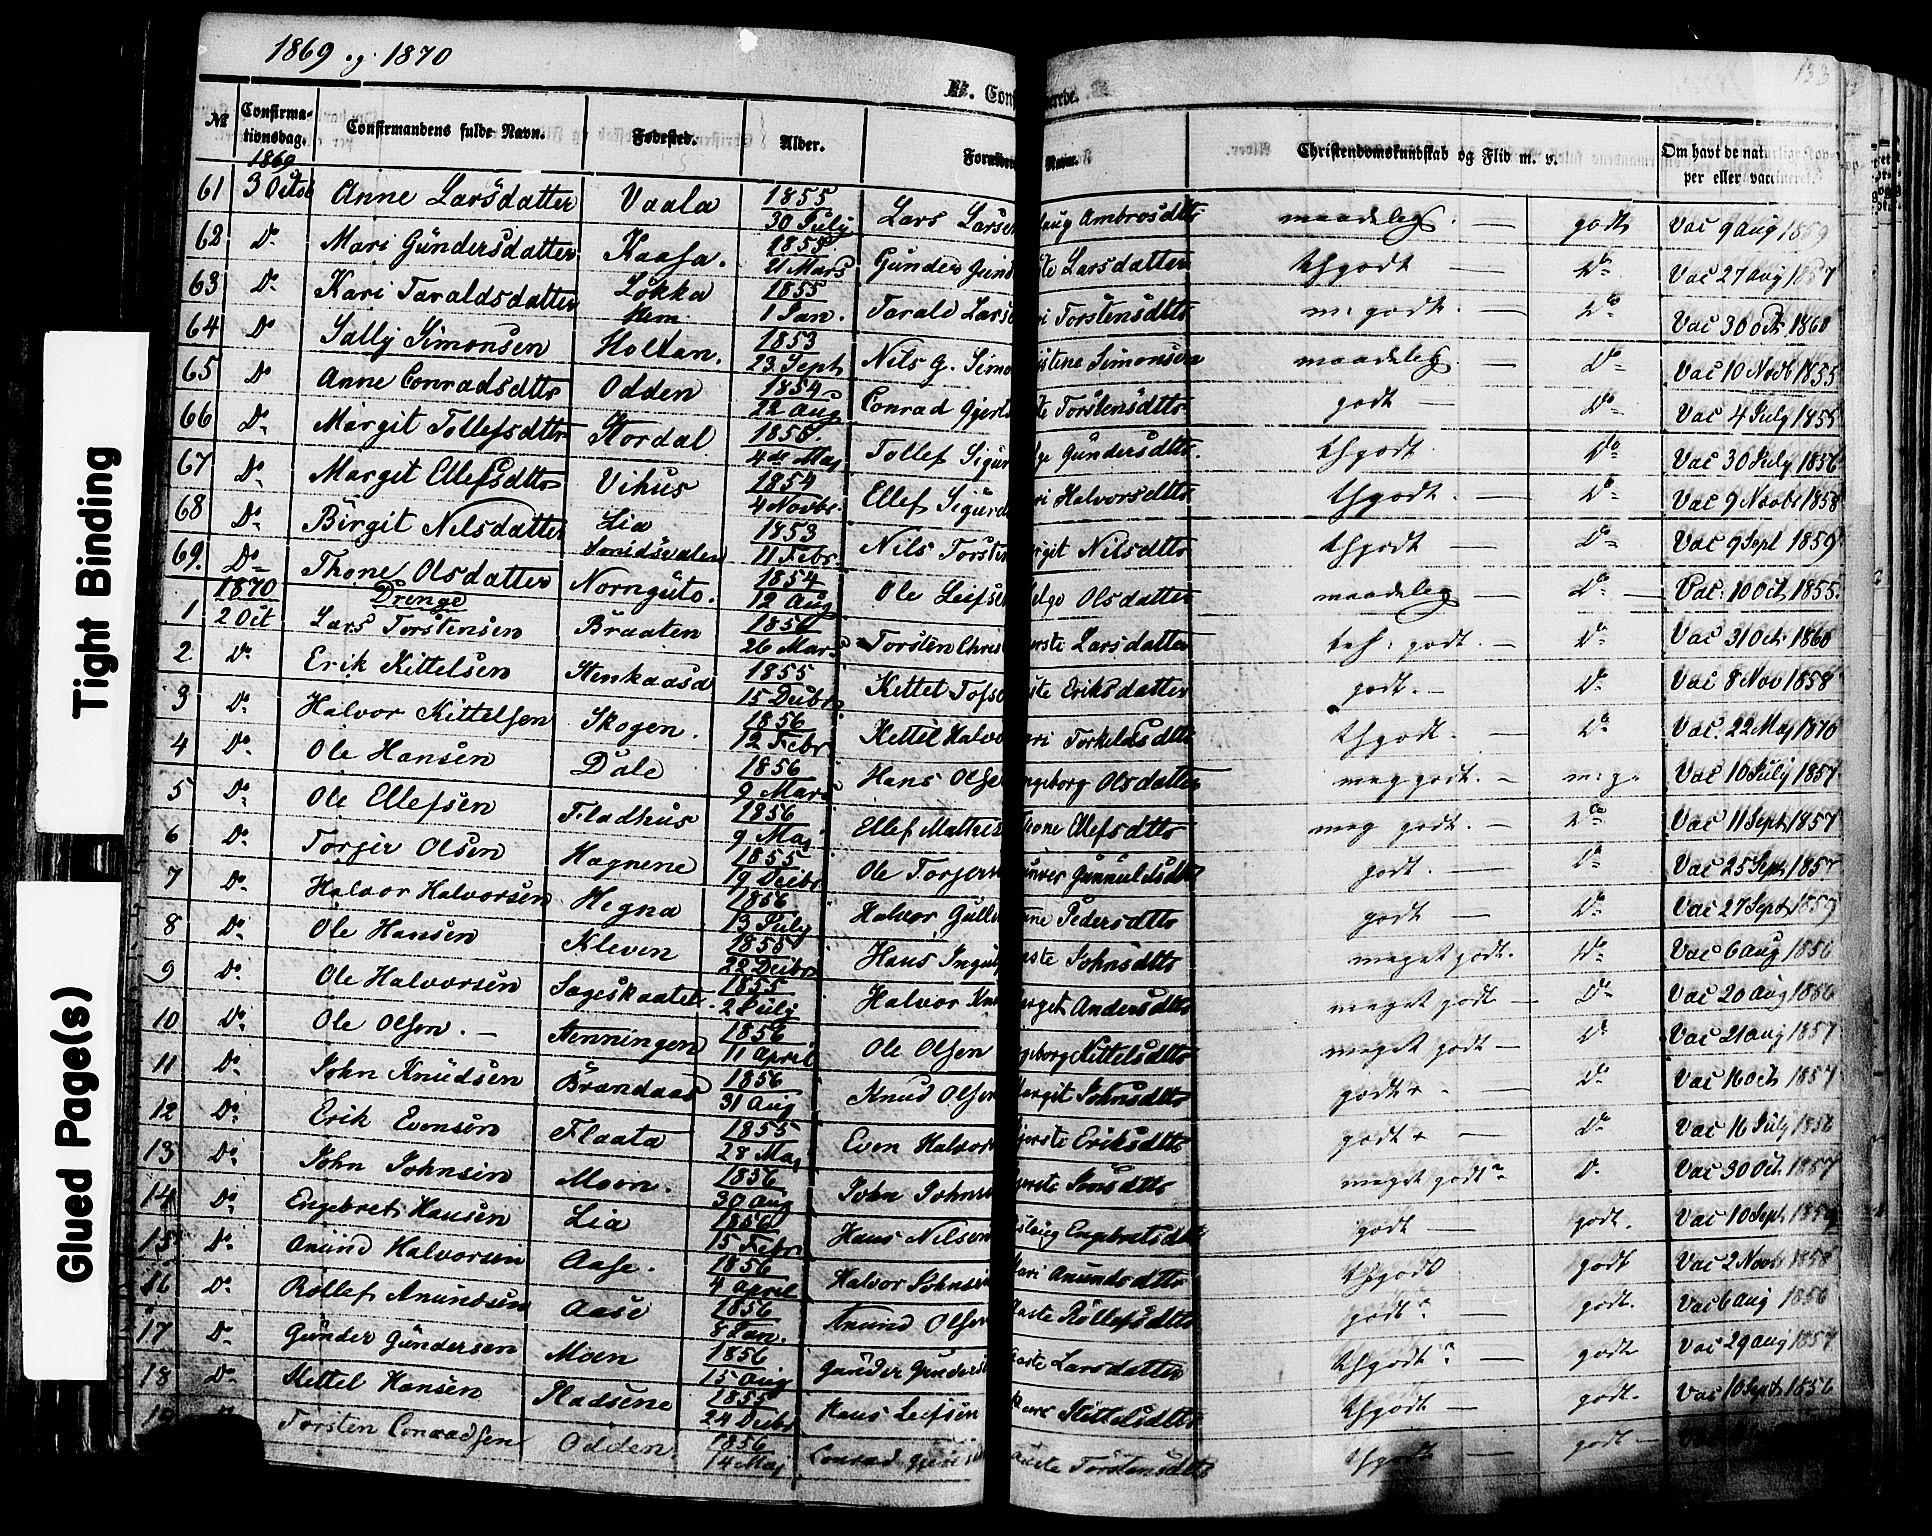 SAKO, Sauherad kirkebøker, F/Fa/L0007: Ministerialbok nr. I 7, 1851-1873, s. 133